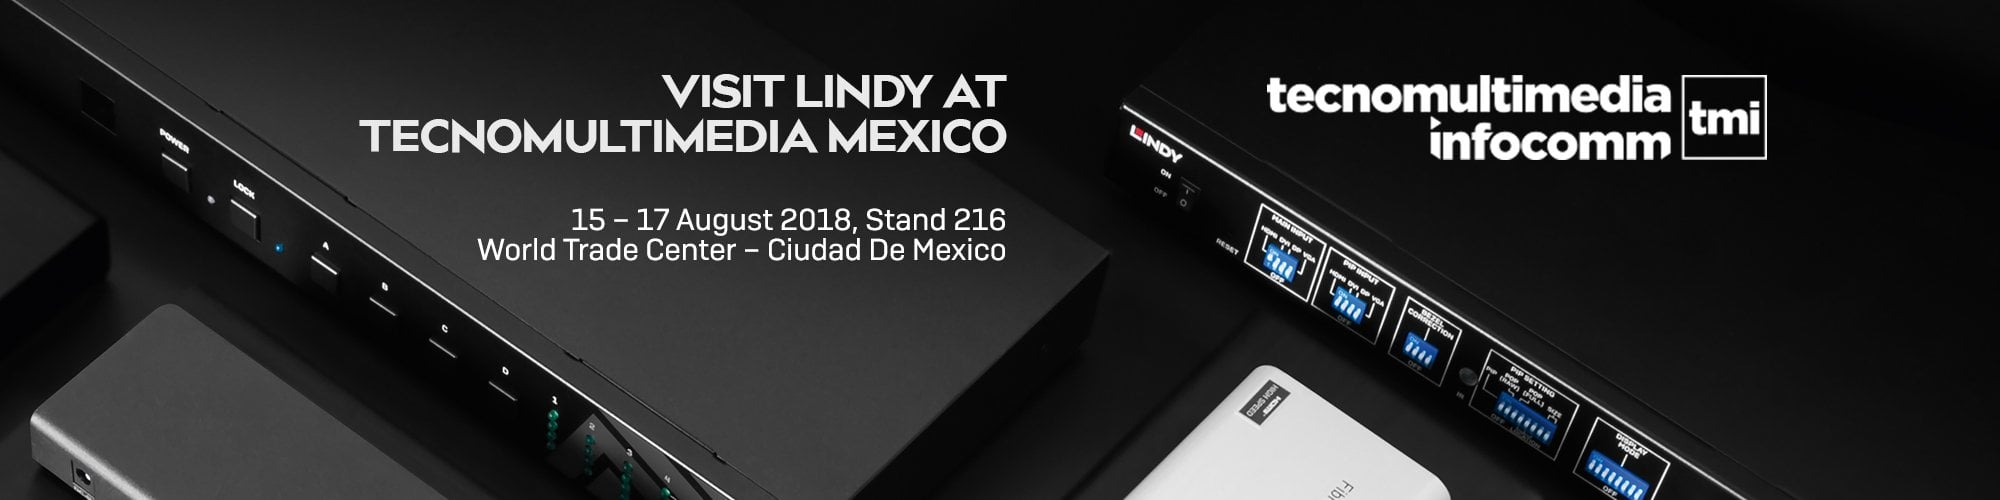 Tecnomultimedia Mexico